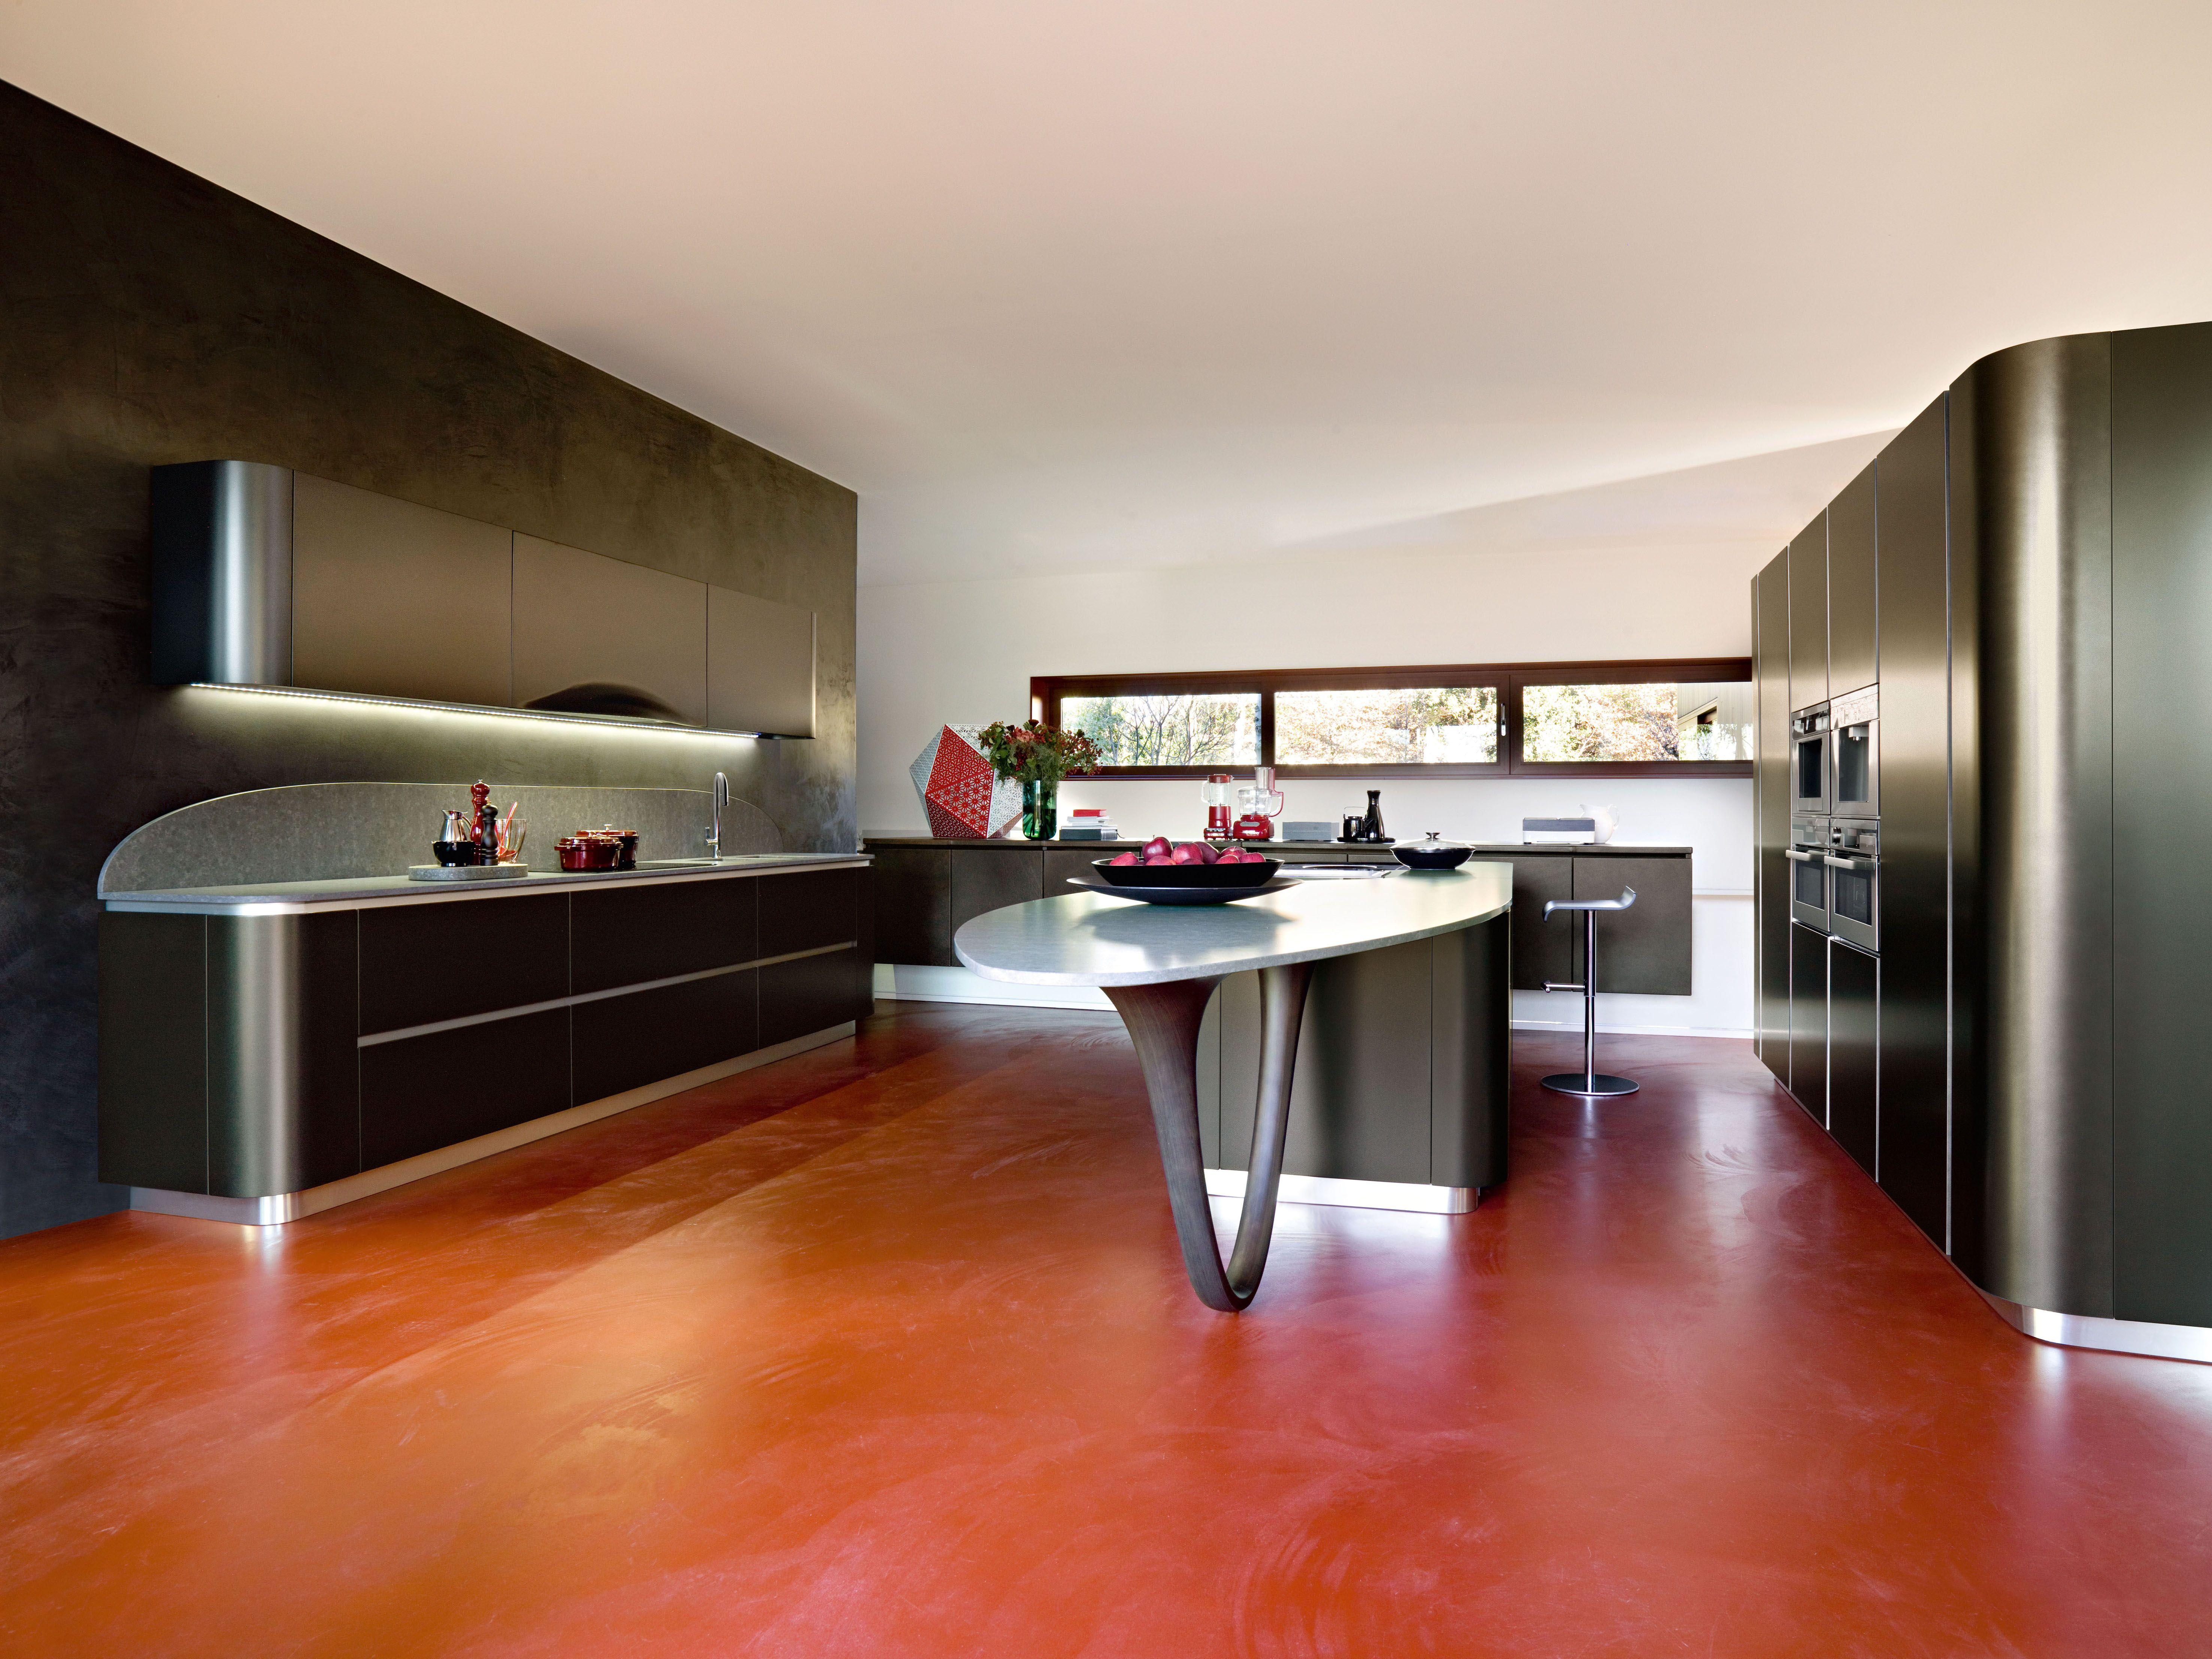 Snaidero #Cucine #Kitchen Ola 20, Pininfarina Design. The hanging ...